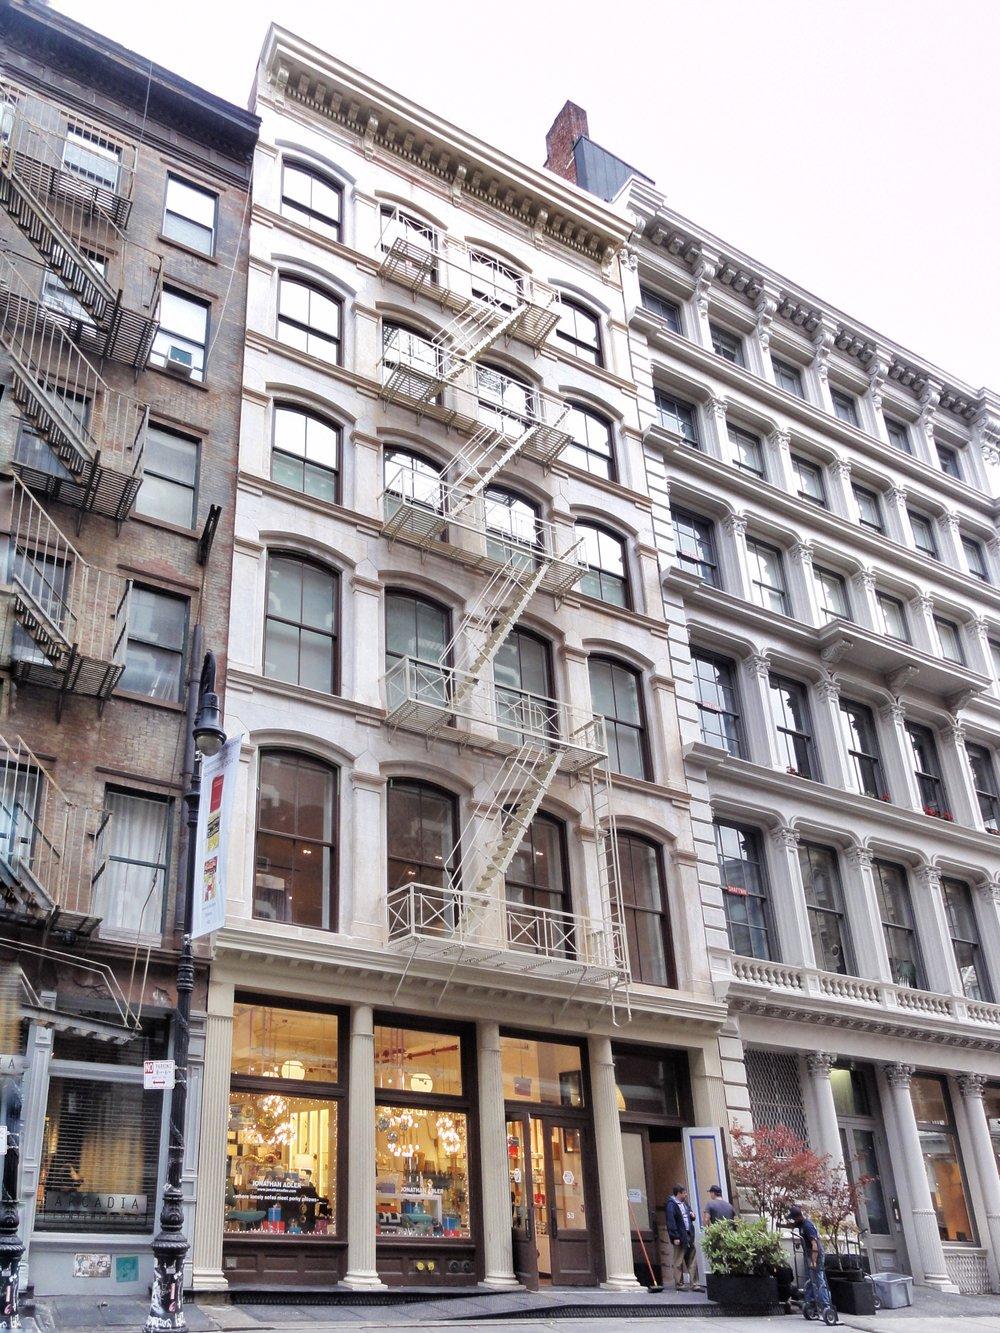 facade (7)_Snapseed.jpg